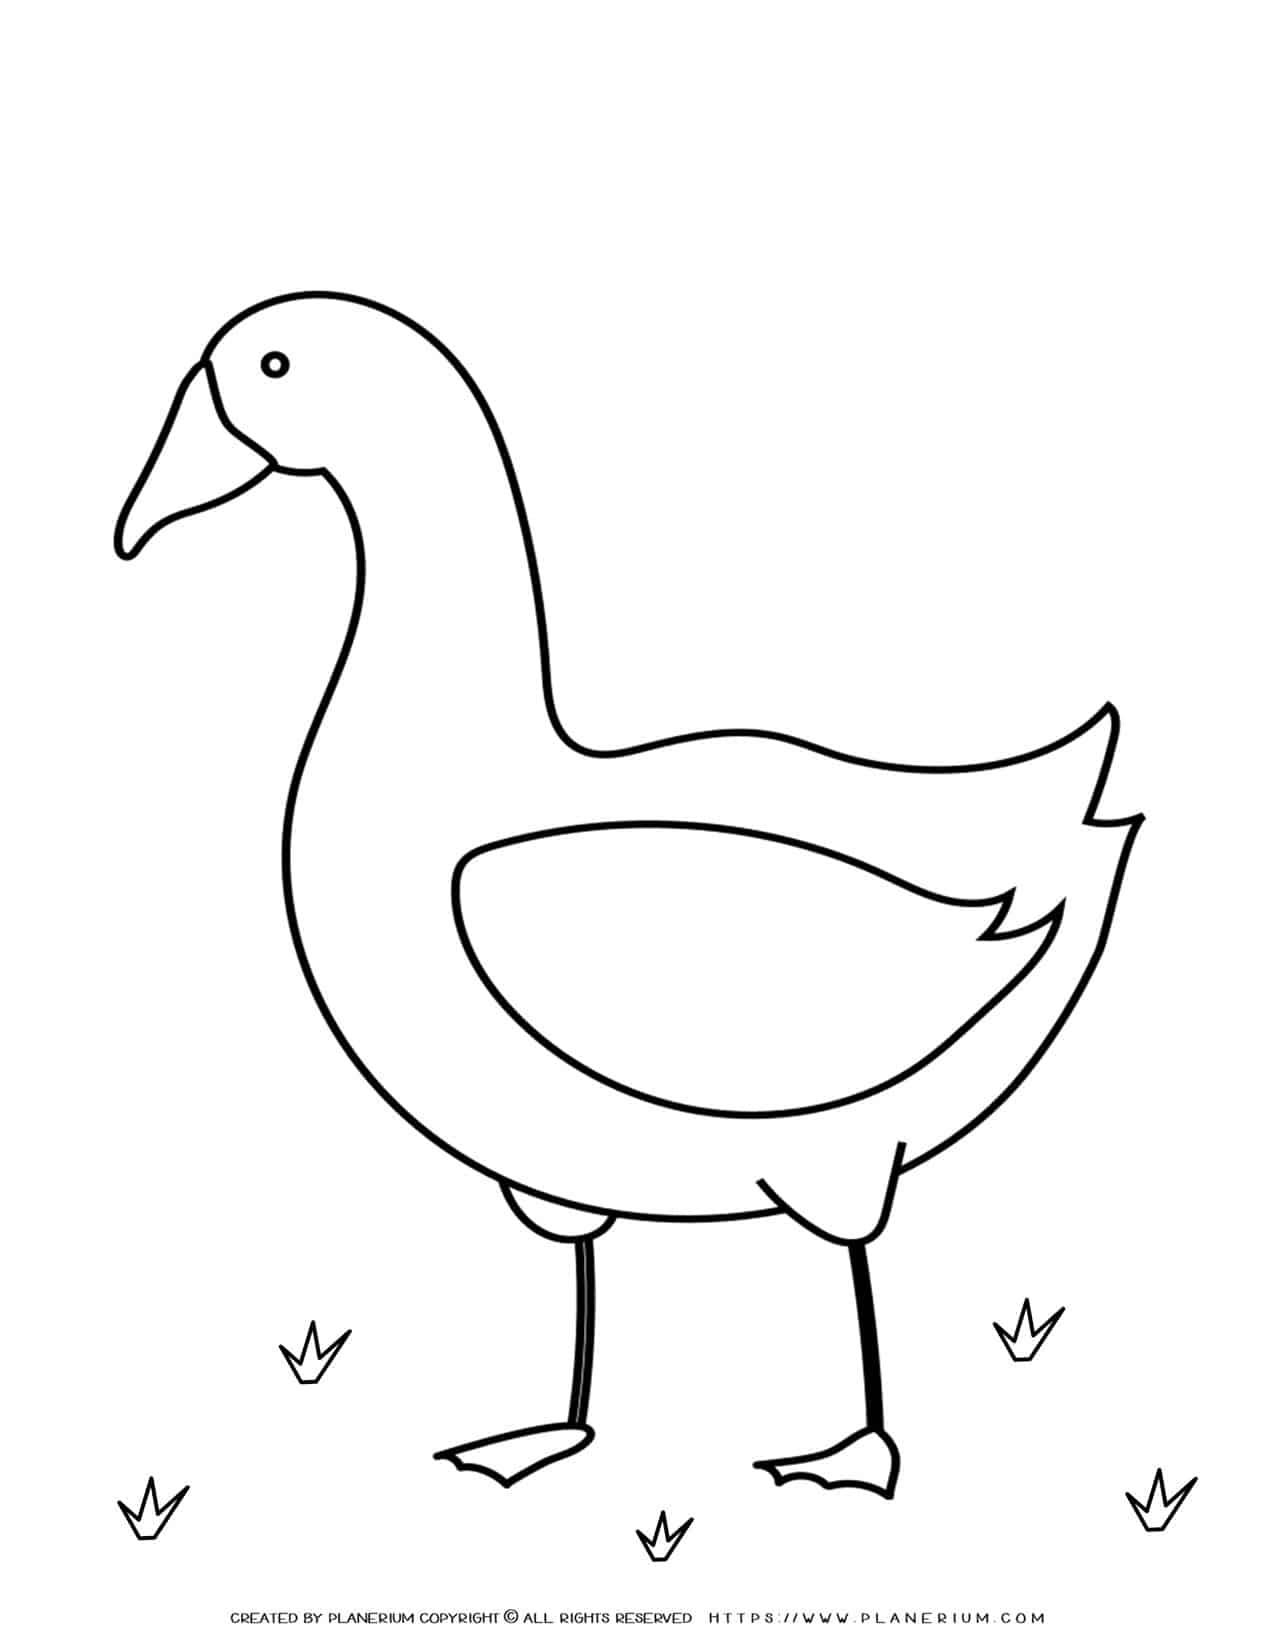 Animals Coloring Page - Goose   Planerium